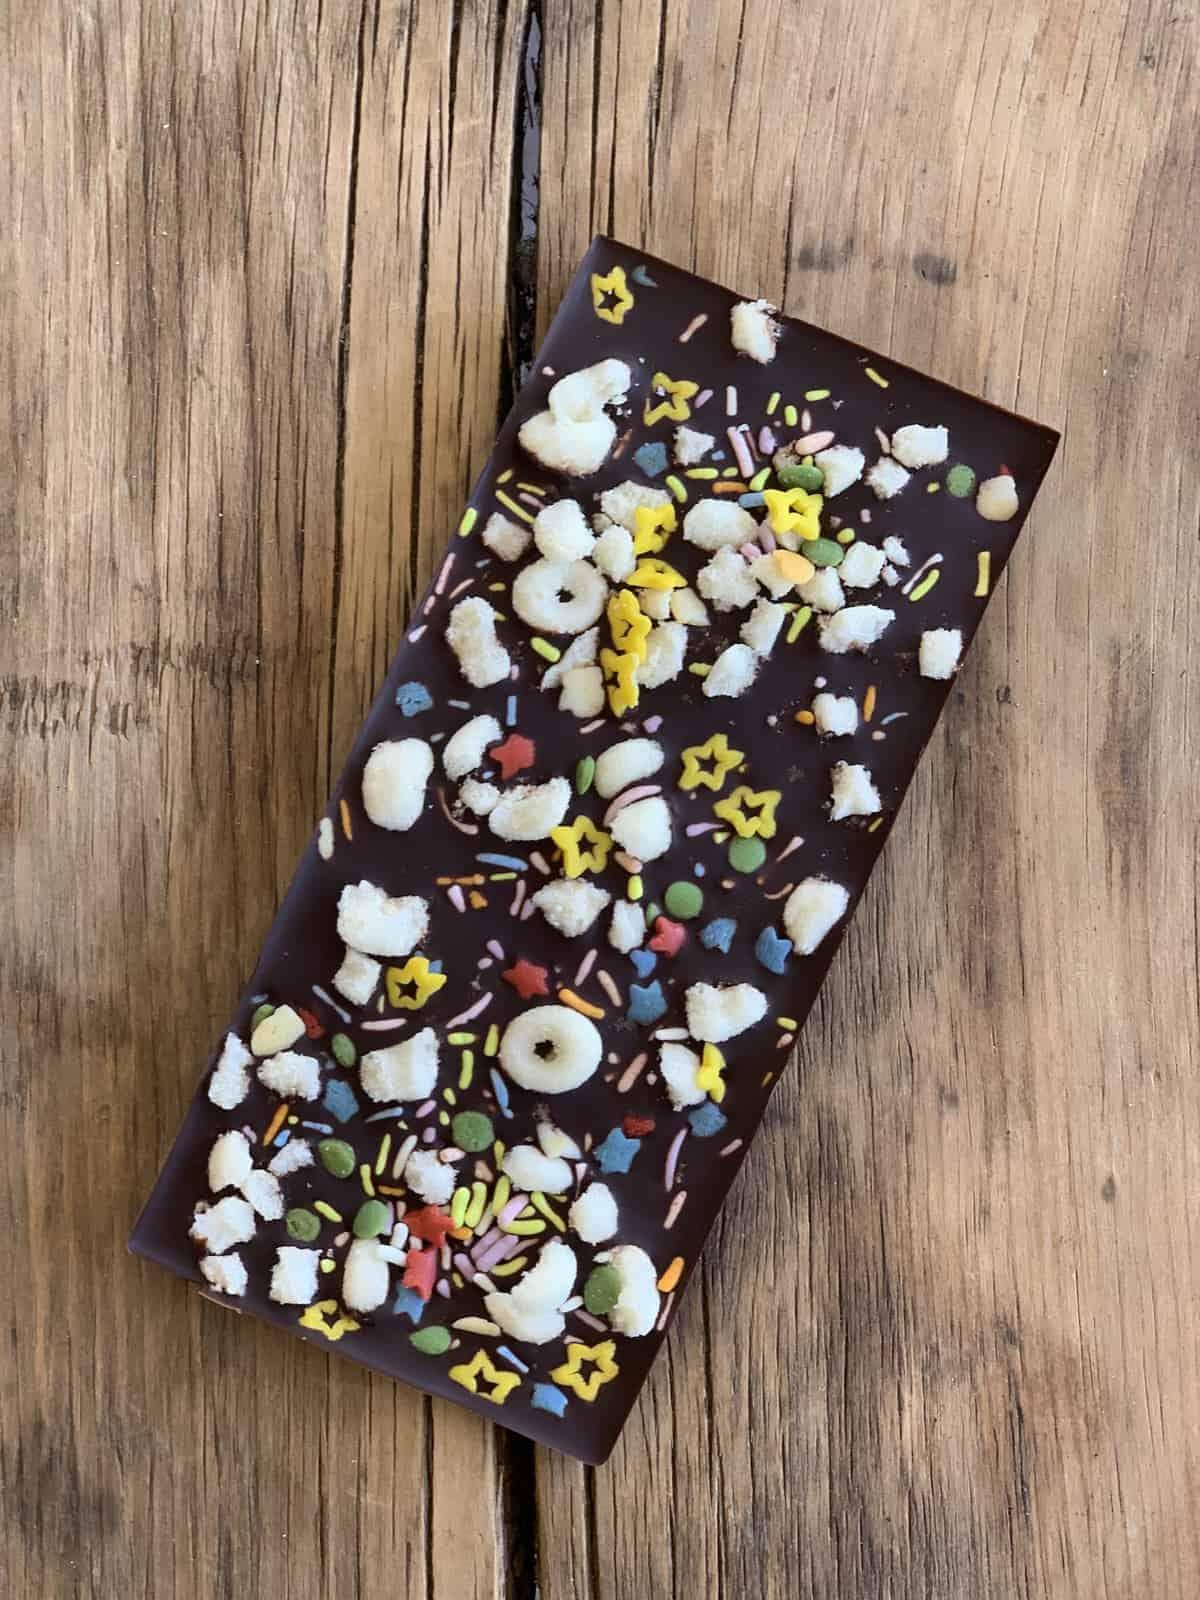 Magic Spoon Birthday Cake Candy Bars